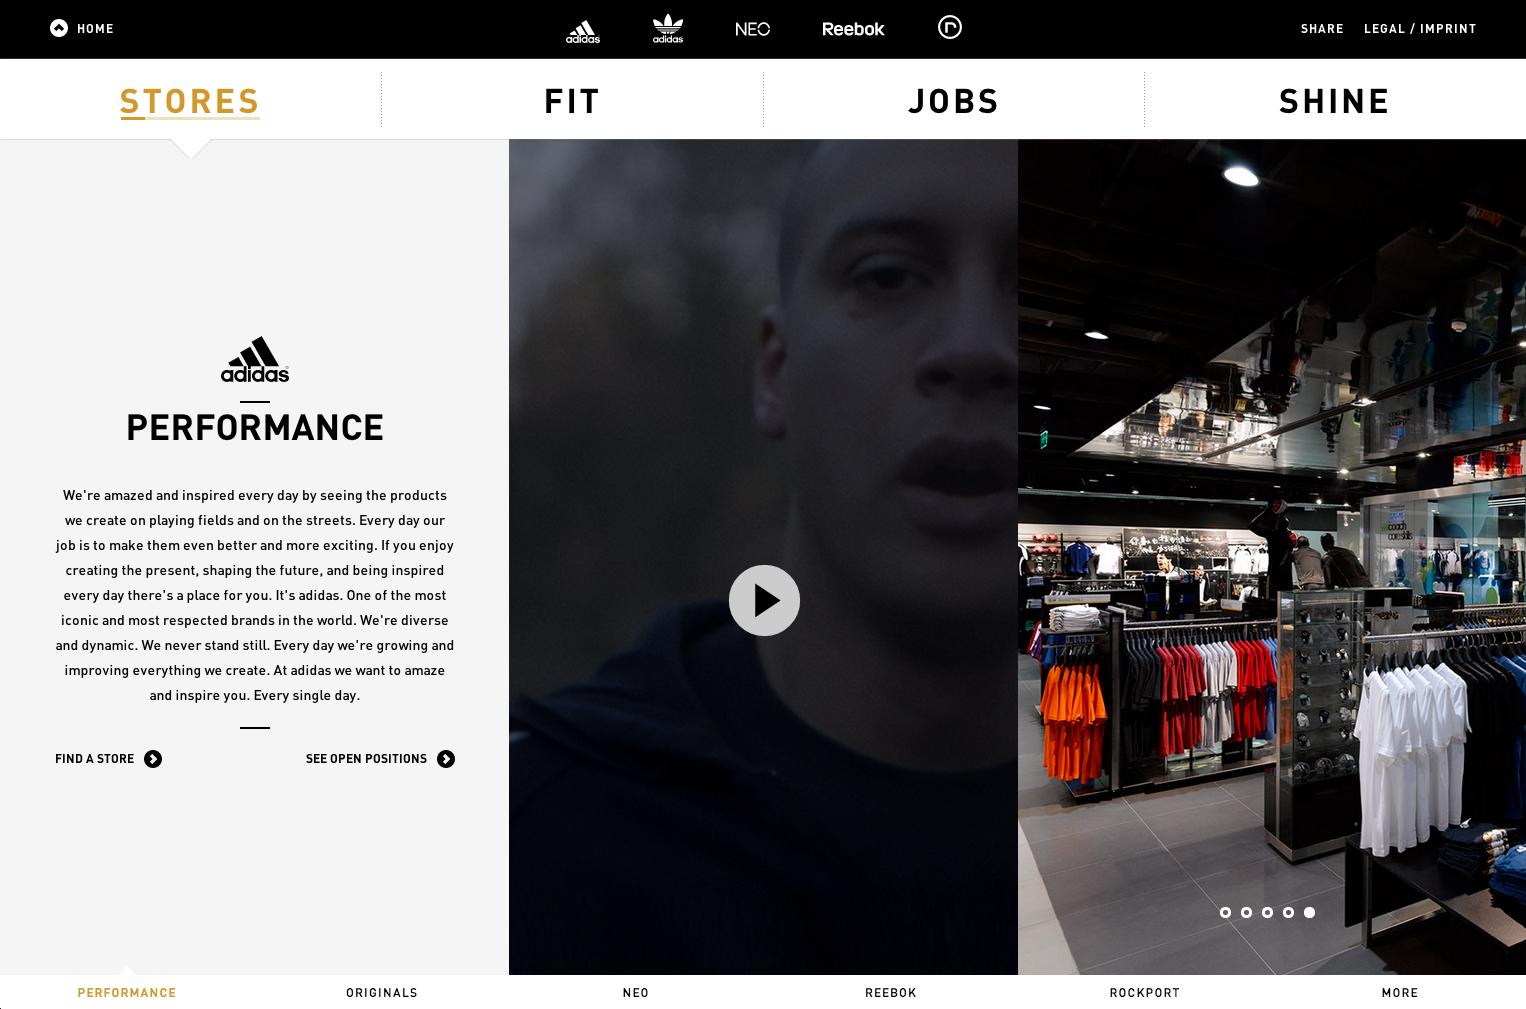 Adidas Group Retail Careers:  http://www.adidasretailjobs.com/